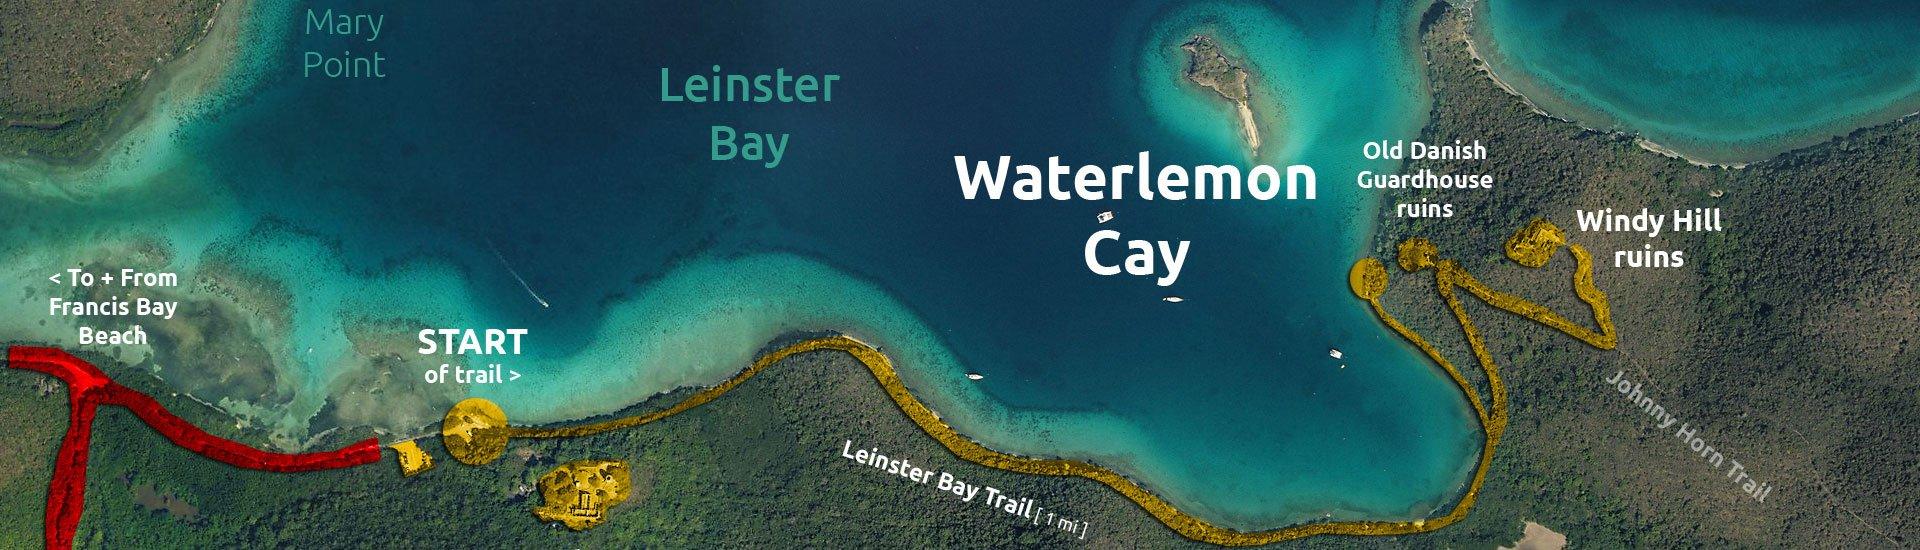 map of waterlemon cay st john us virgin islands national park